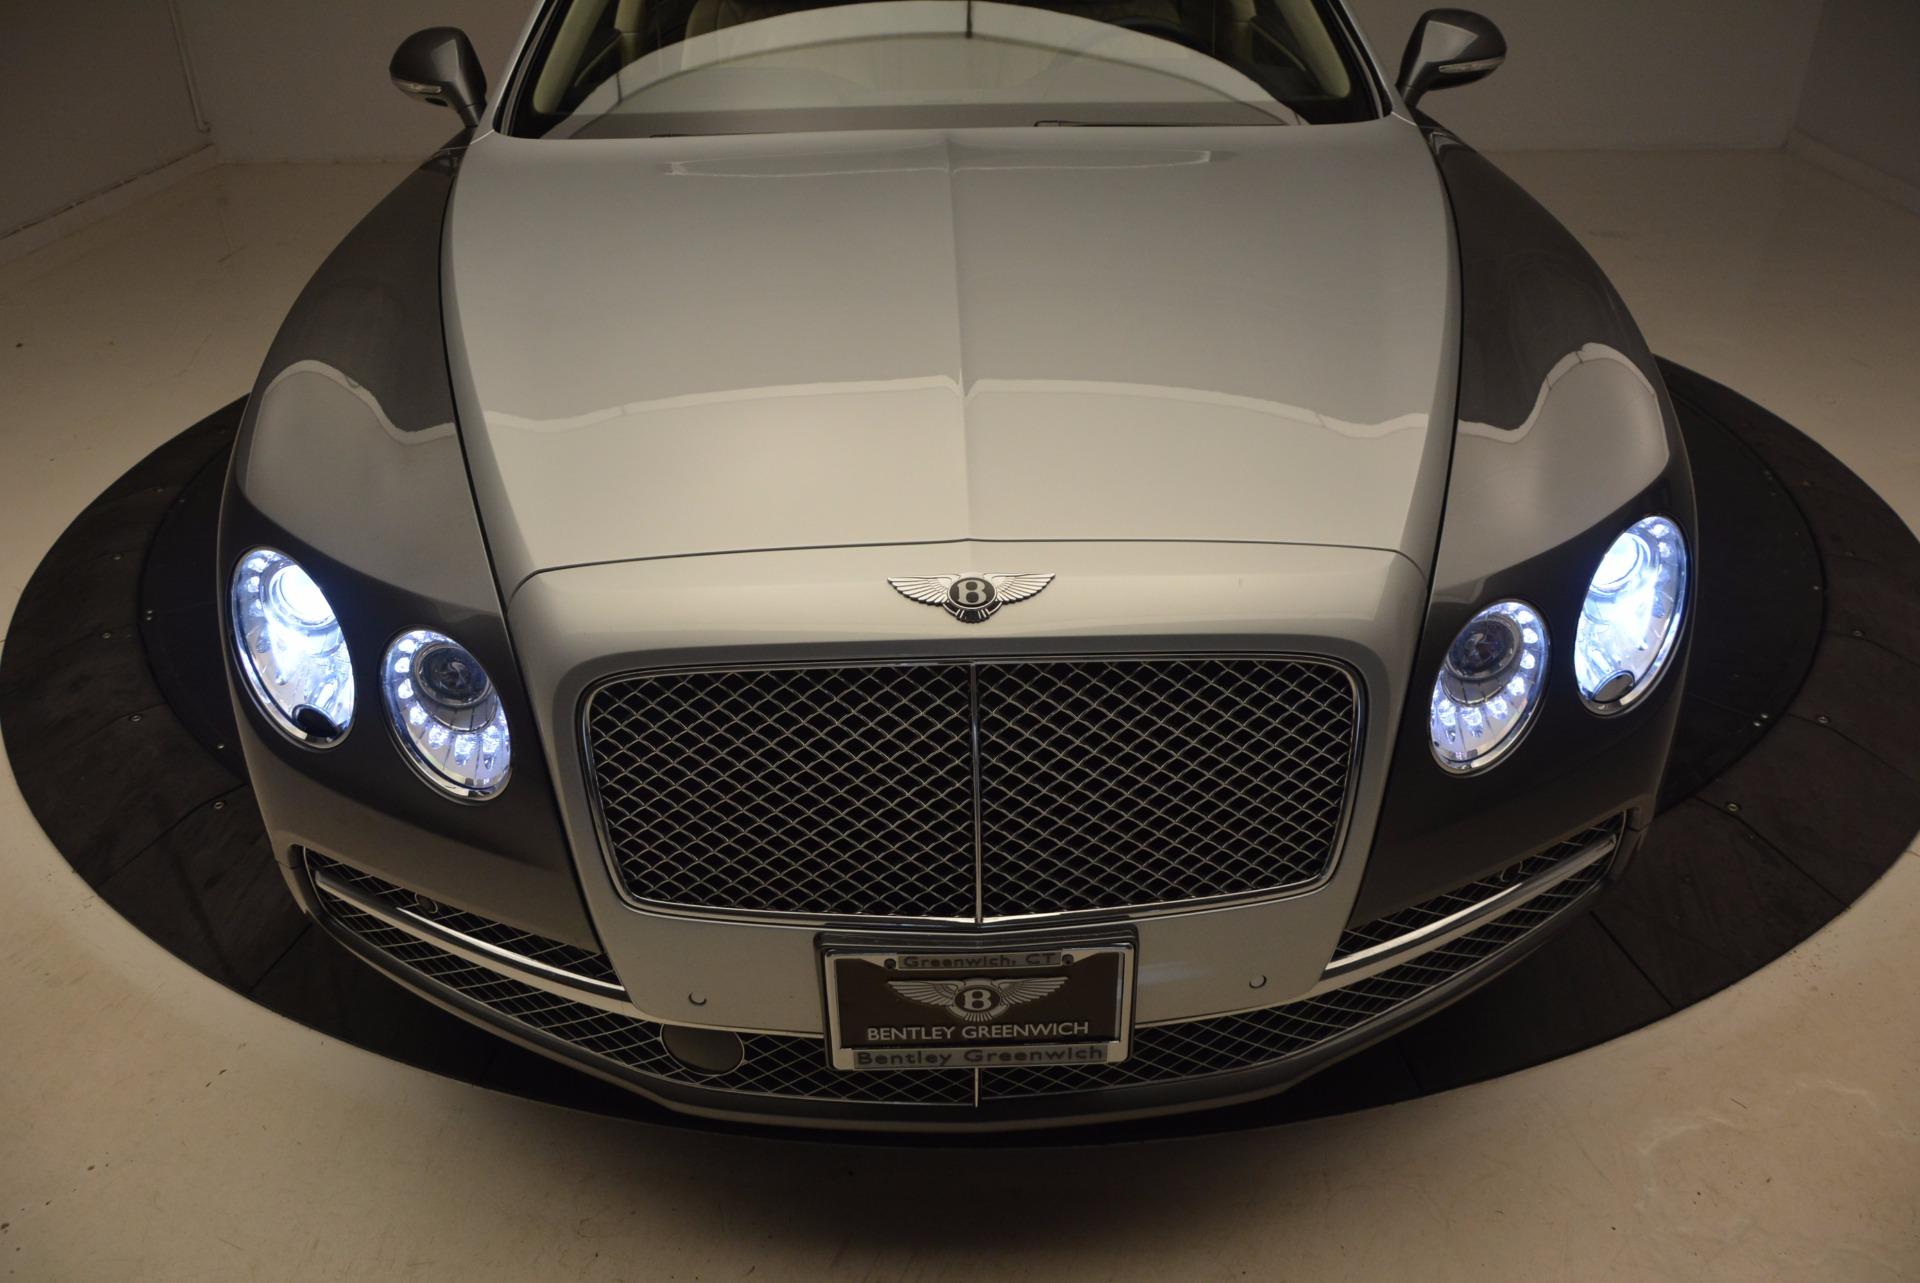 Used 2015 Bentley Flying Spur W12 For Sale In Westport, CT 1582_p17